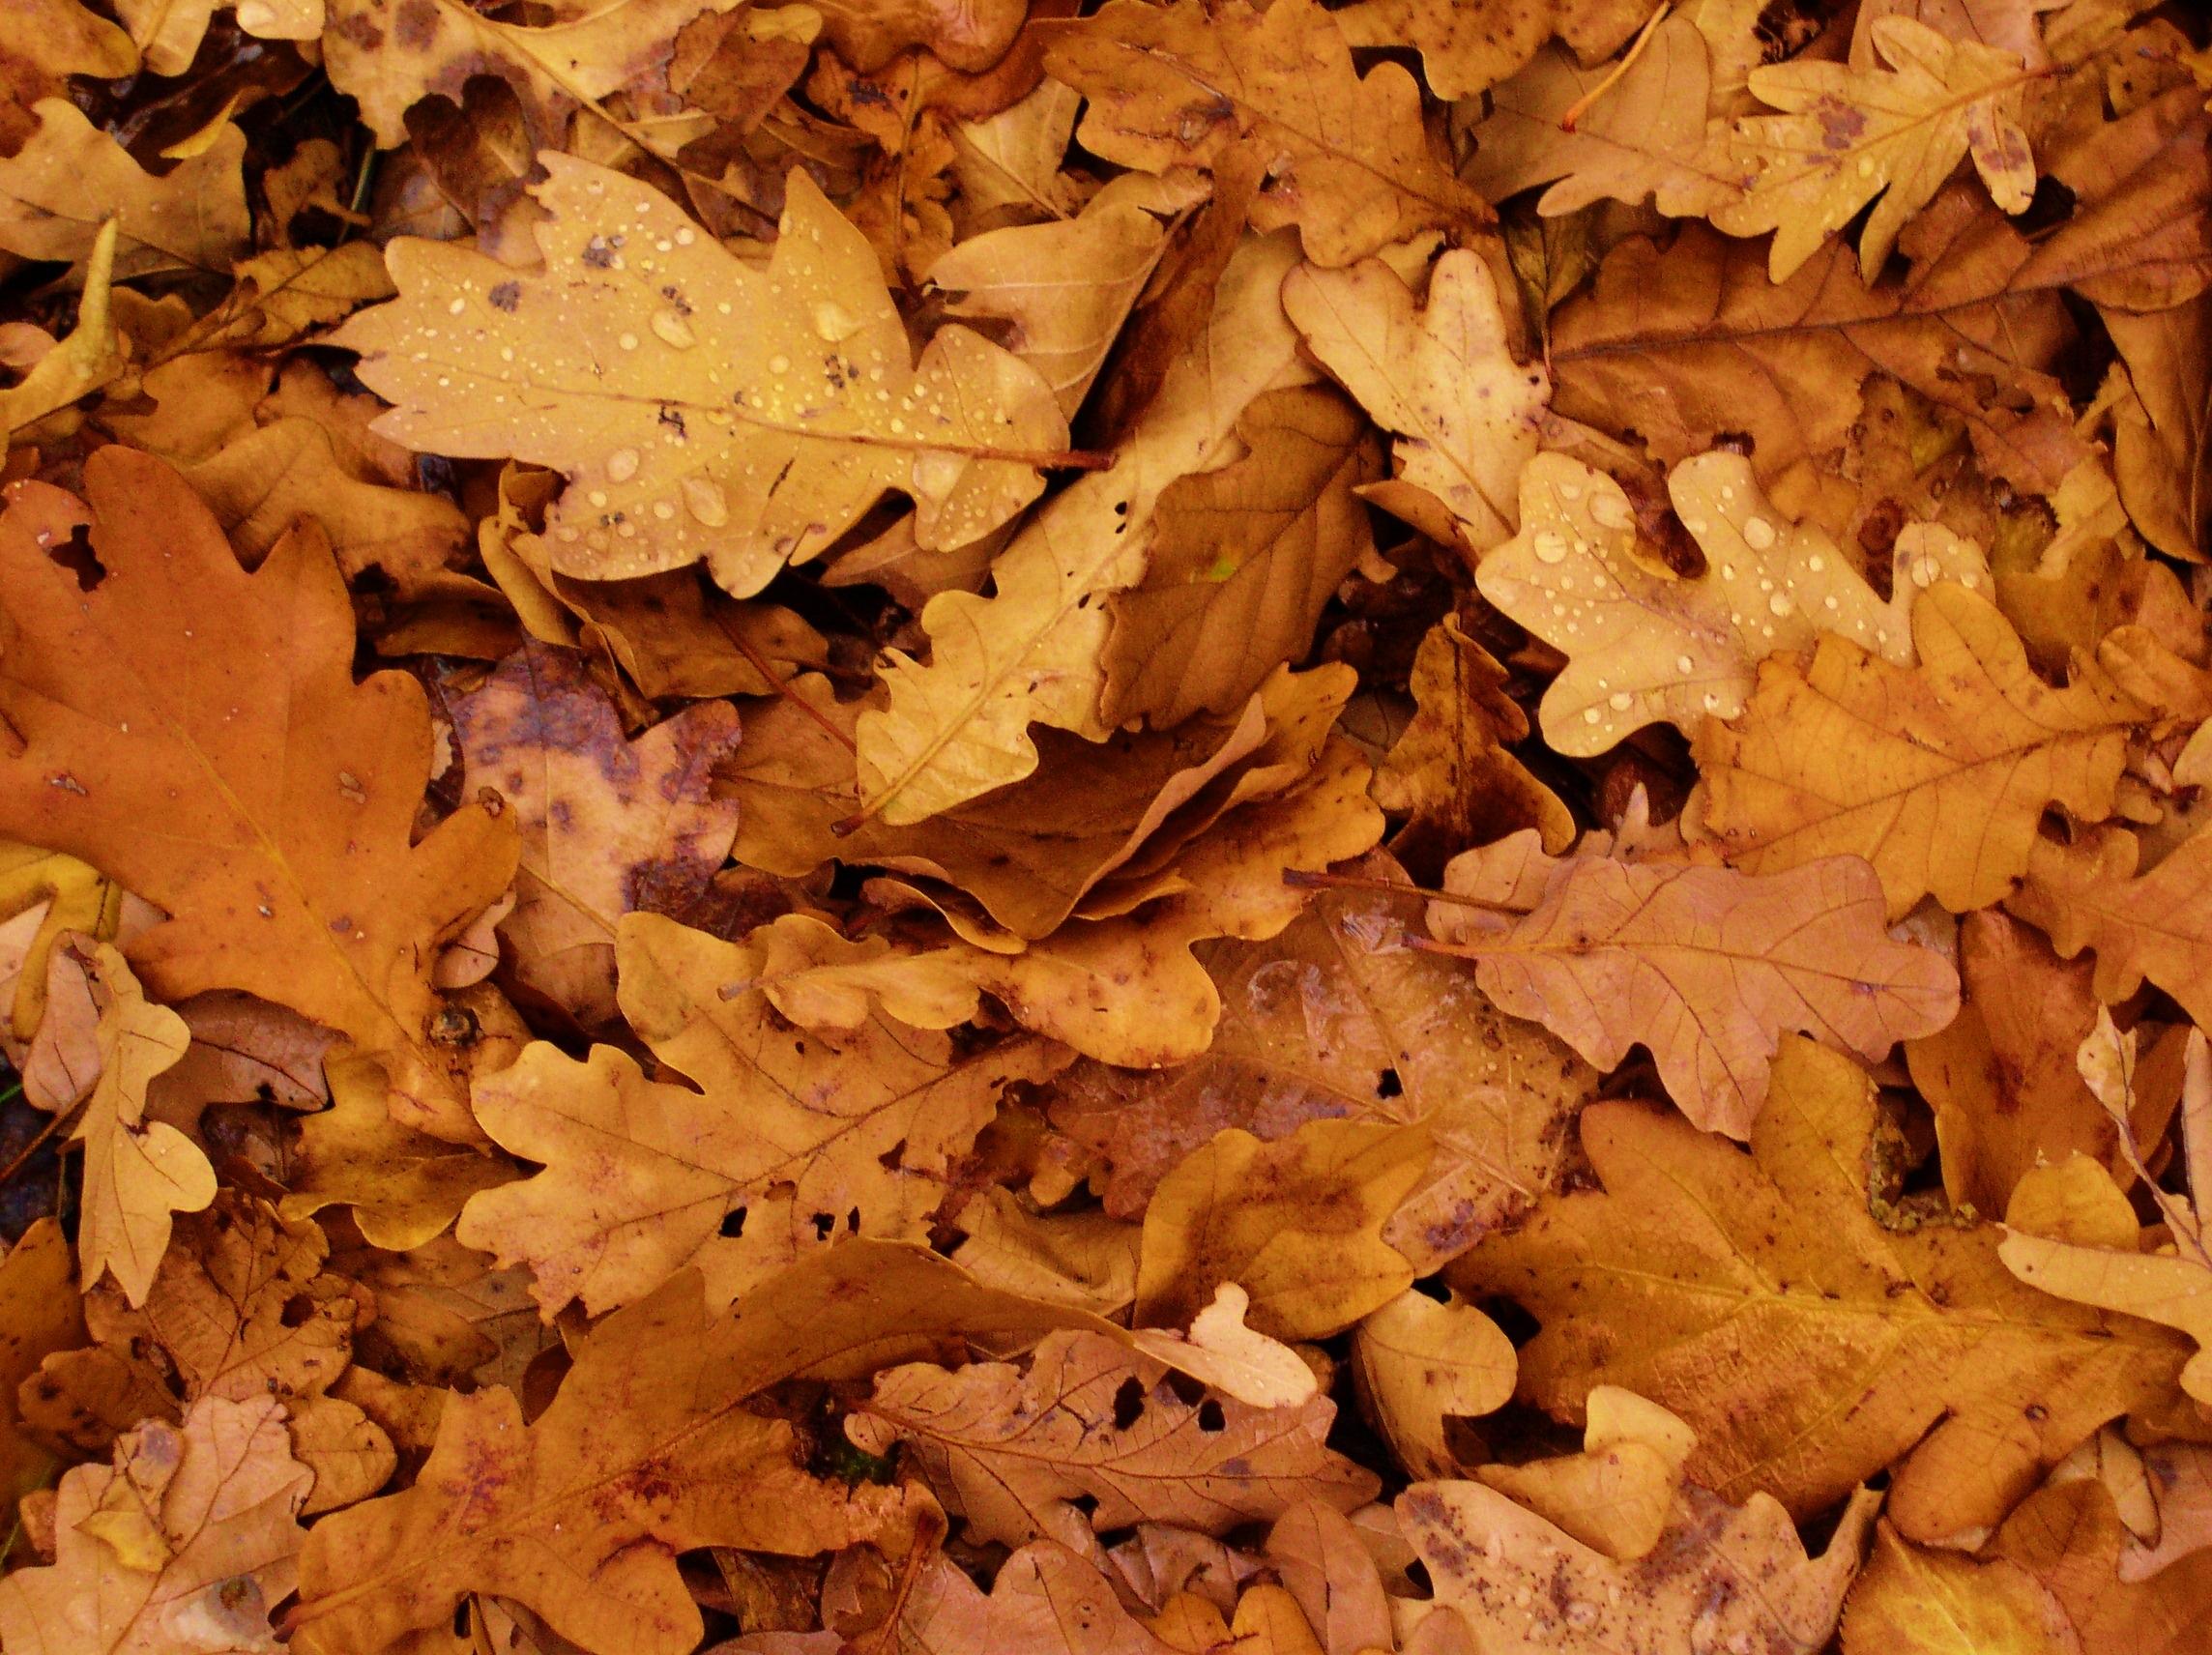 Осень картинки листья дуба